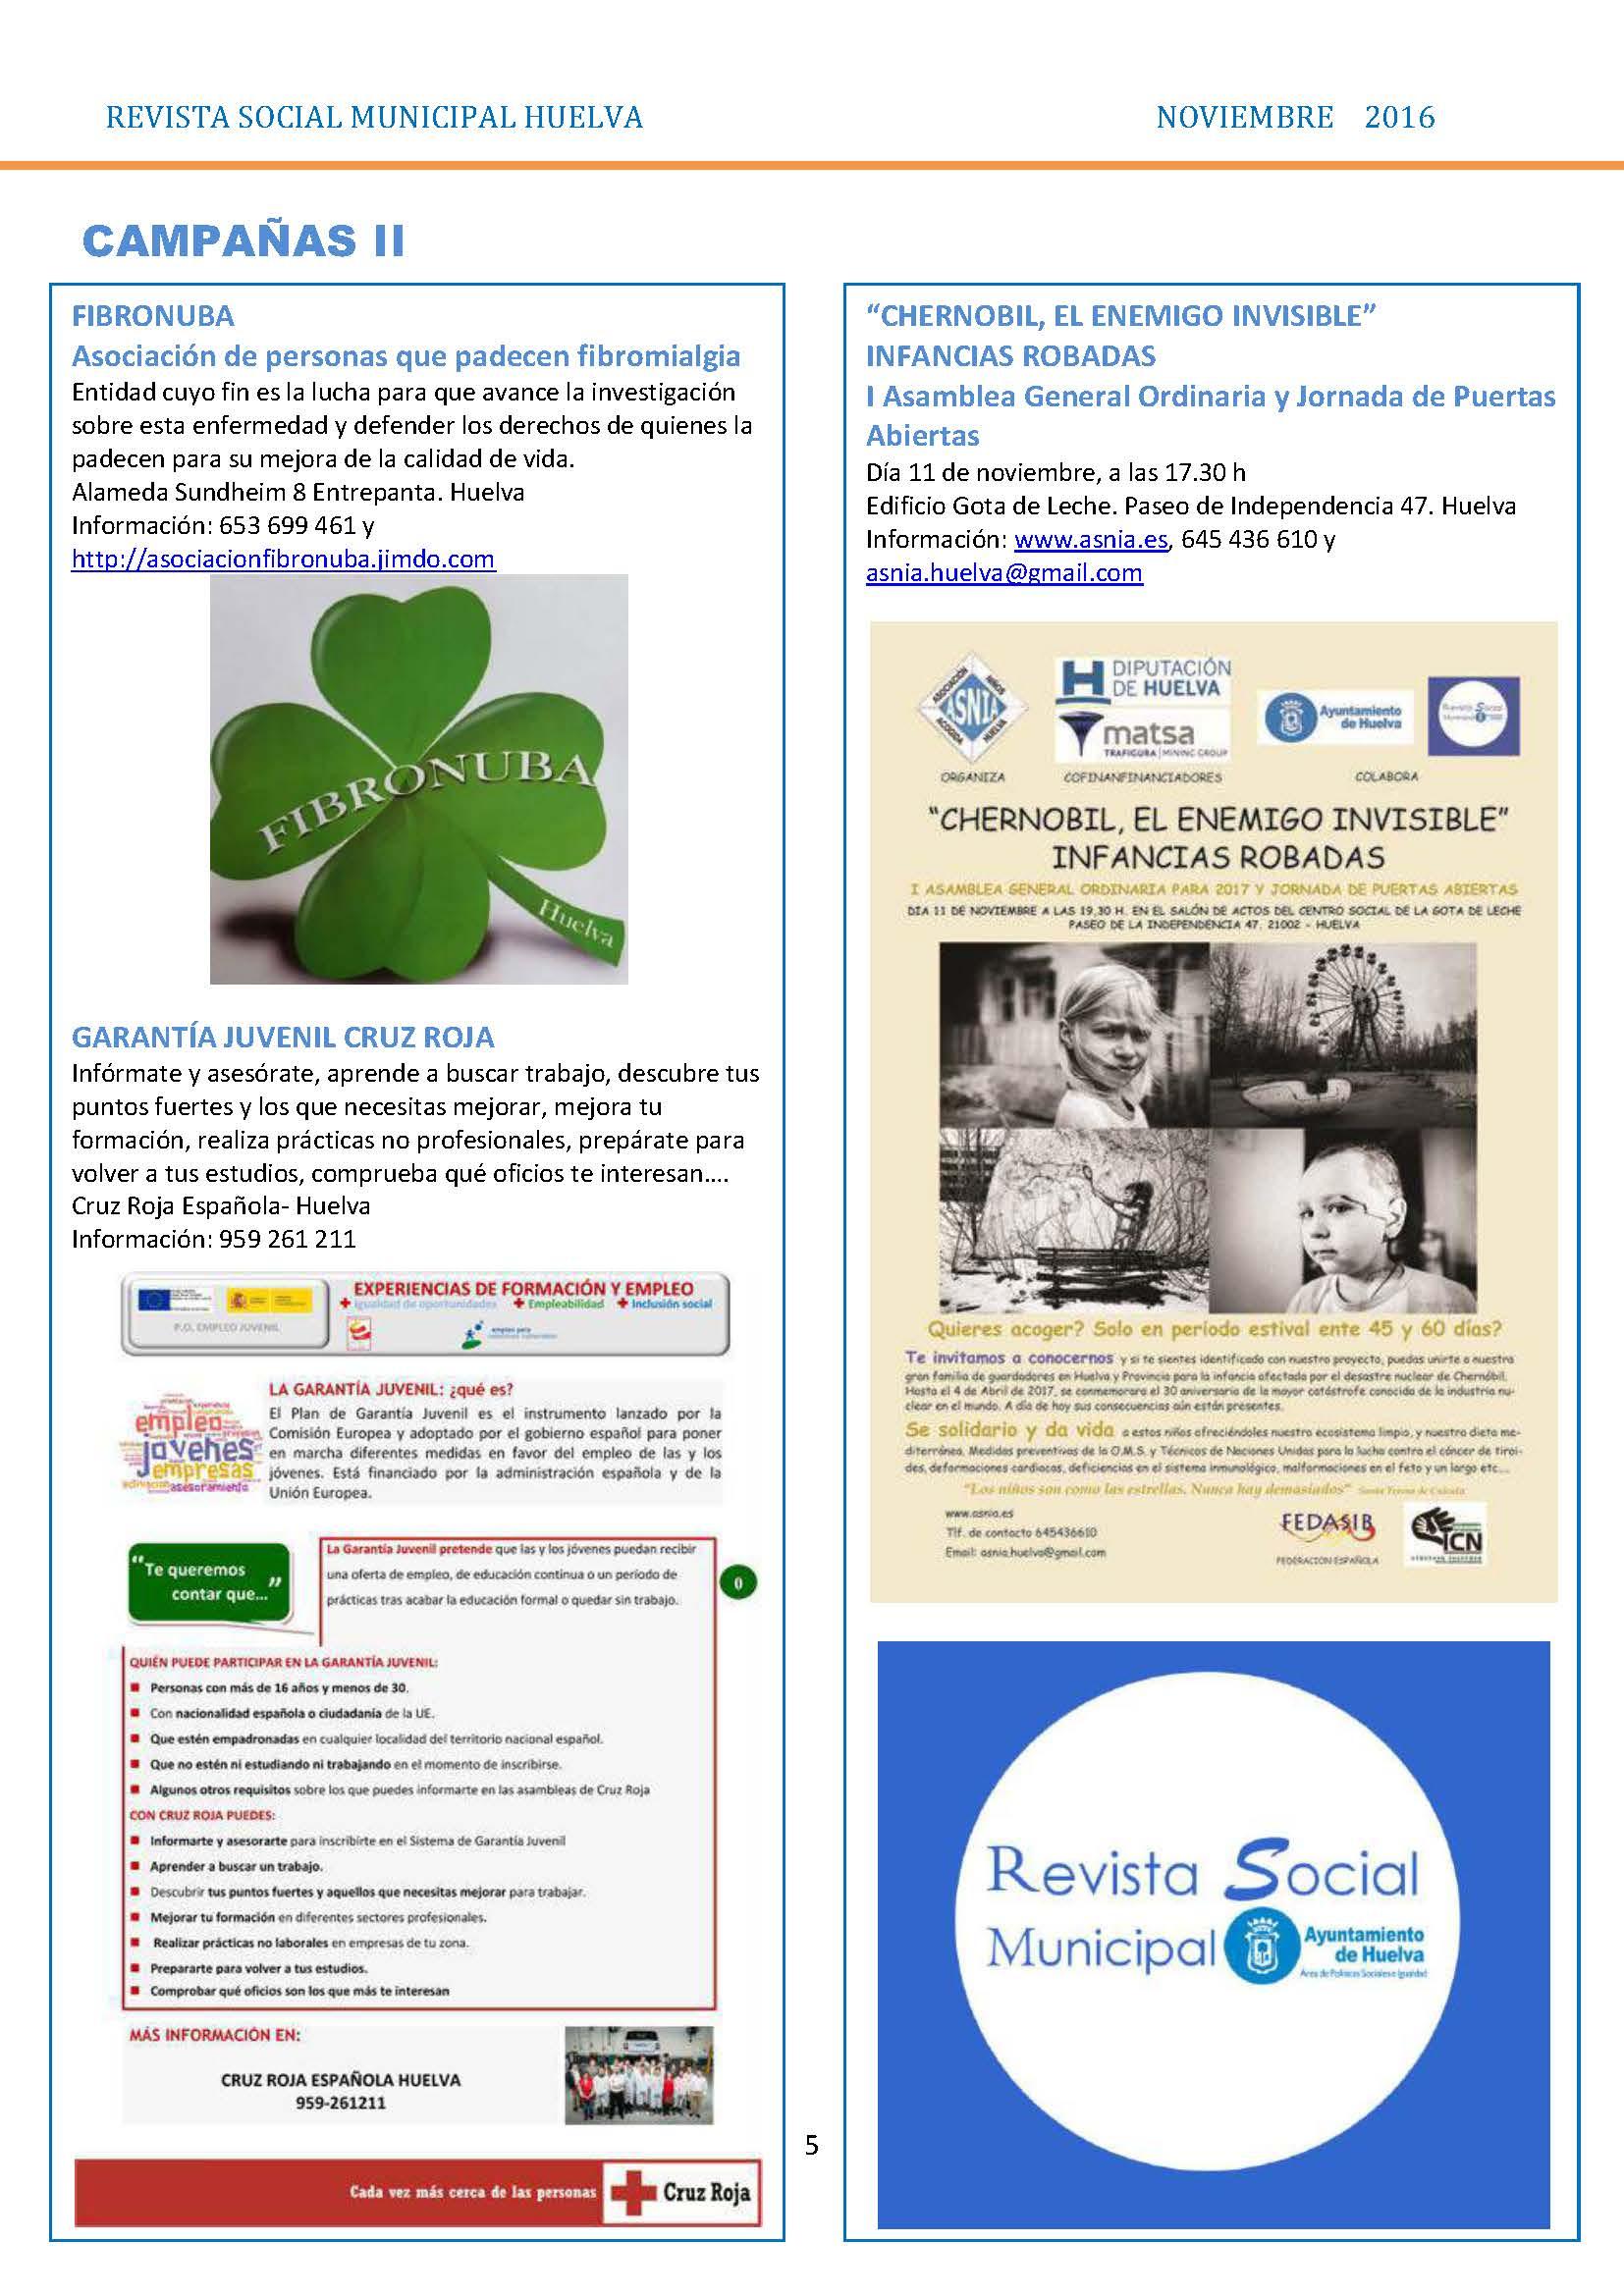 revista-social-municipal-7-noviembre-compressed_pagina_06